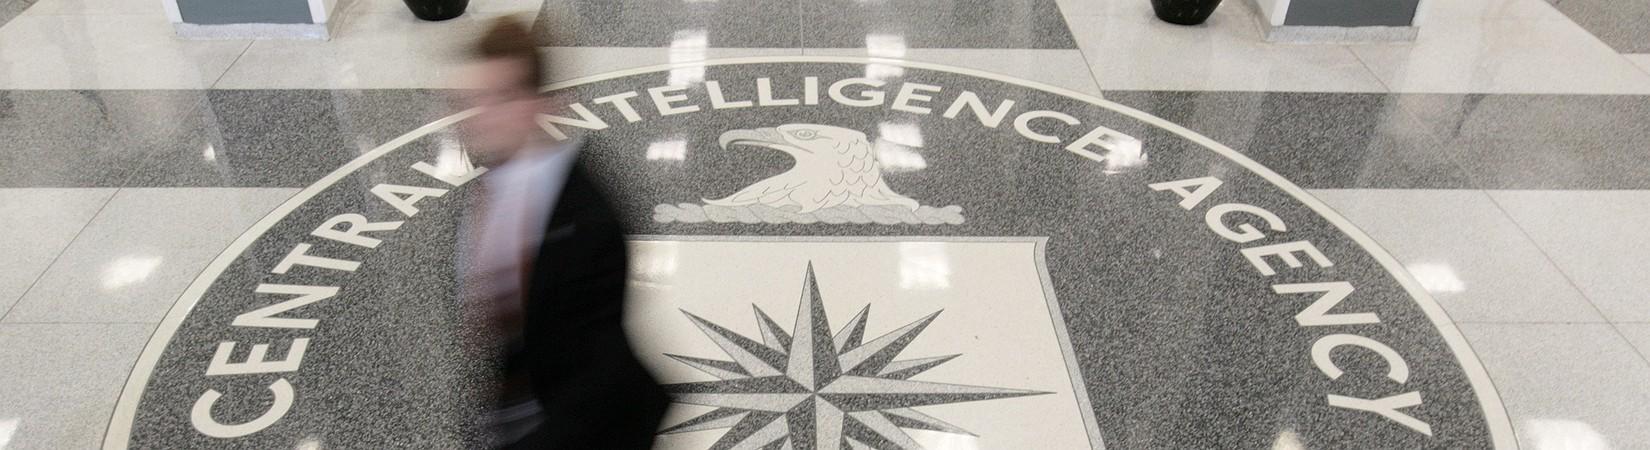 Vault 7, WikiLeaks svela i documenti della CIA